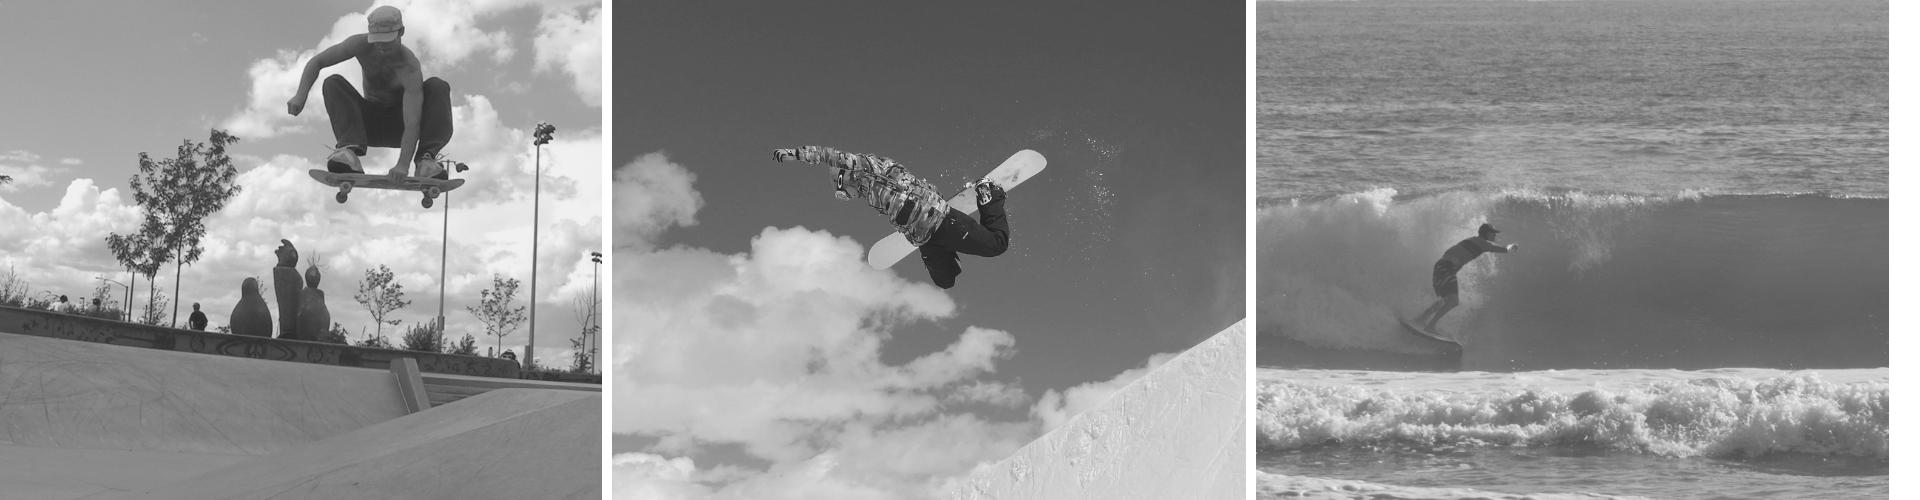 Fitness Vida coach Eric Manthey Skate snow surf image